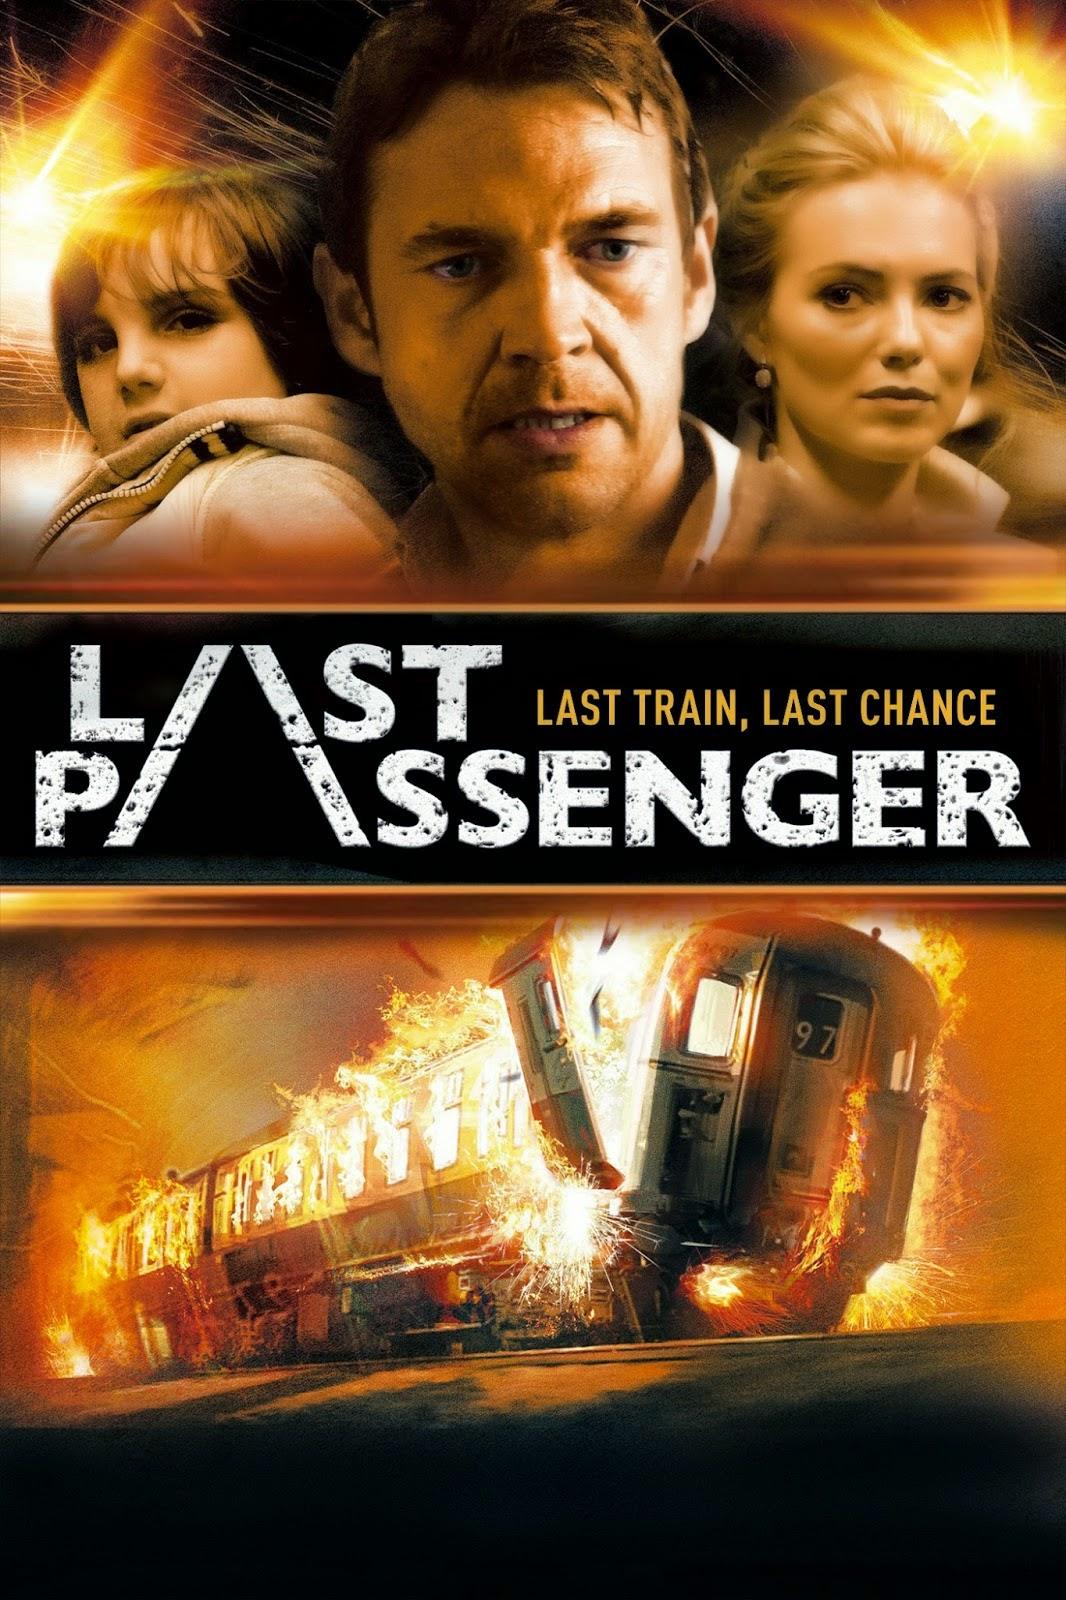 LAST PASSENGER โคตรด่วนขบวนตาย HD 2013 FULL HD 1080P พากย์ไทย มาสเตอร์